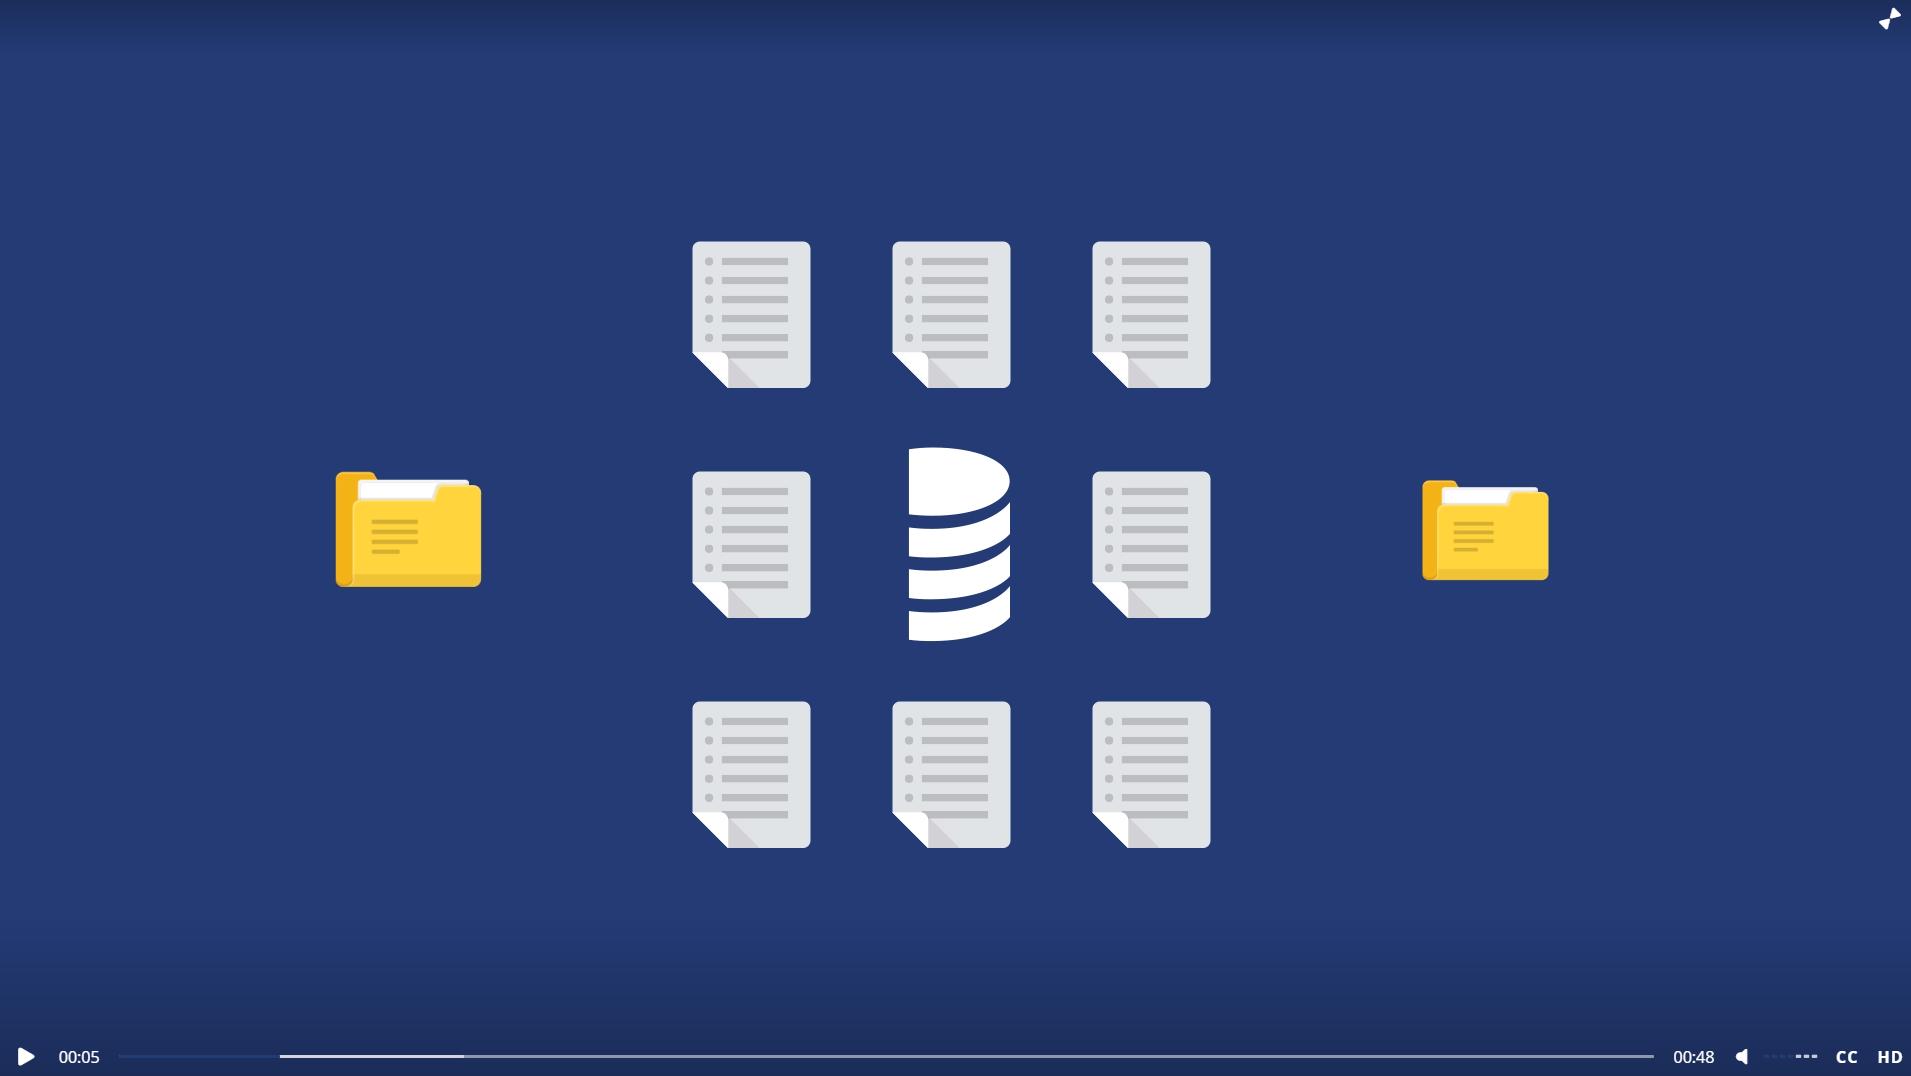 iServer 2019 User Accreditation